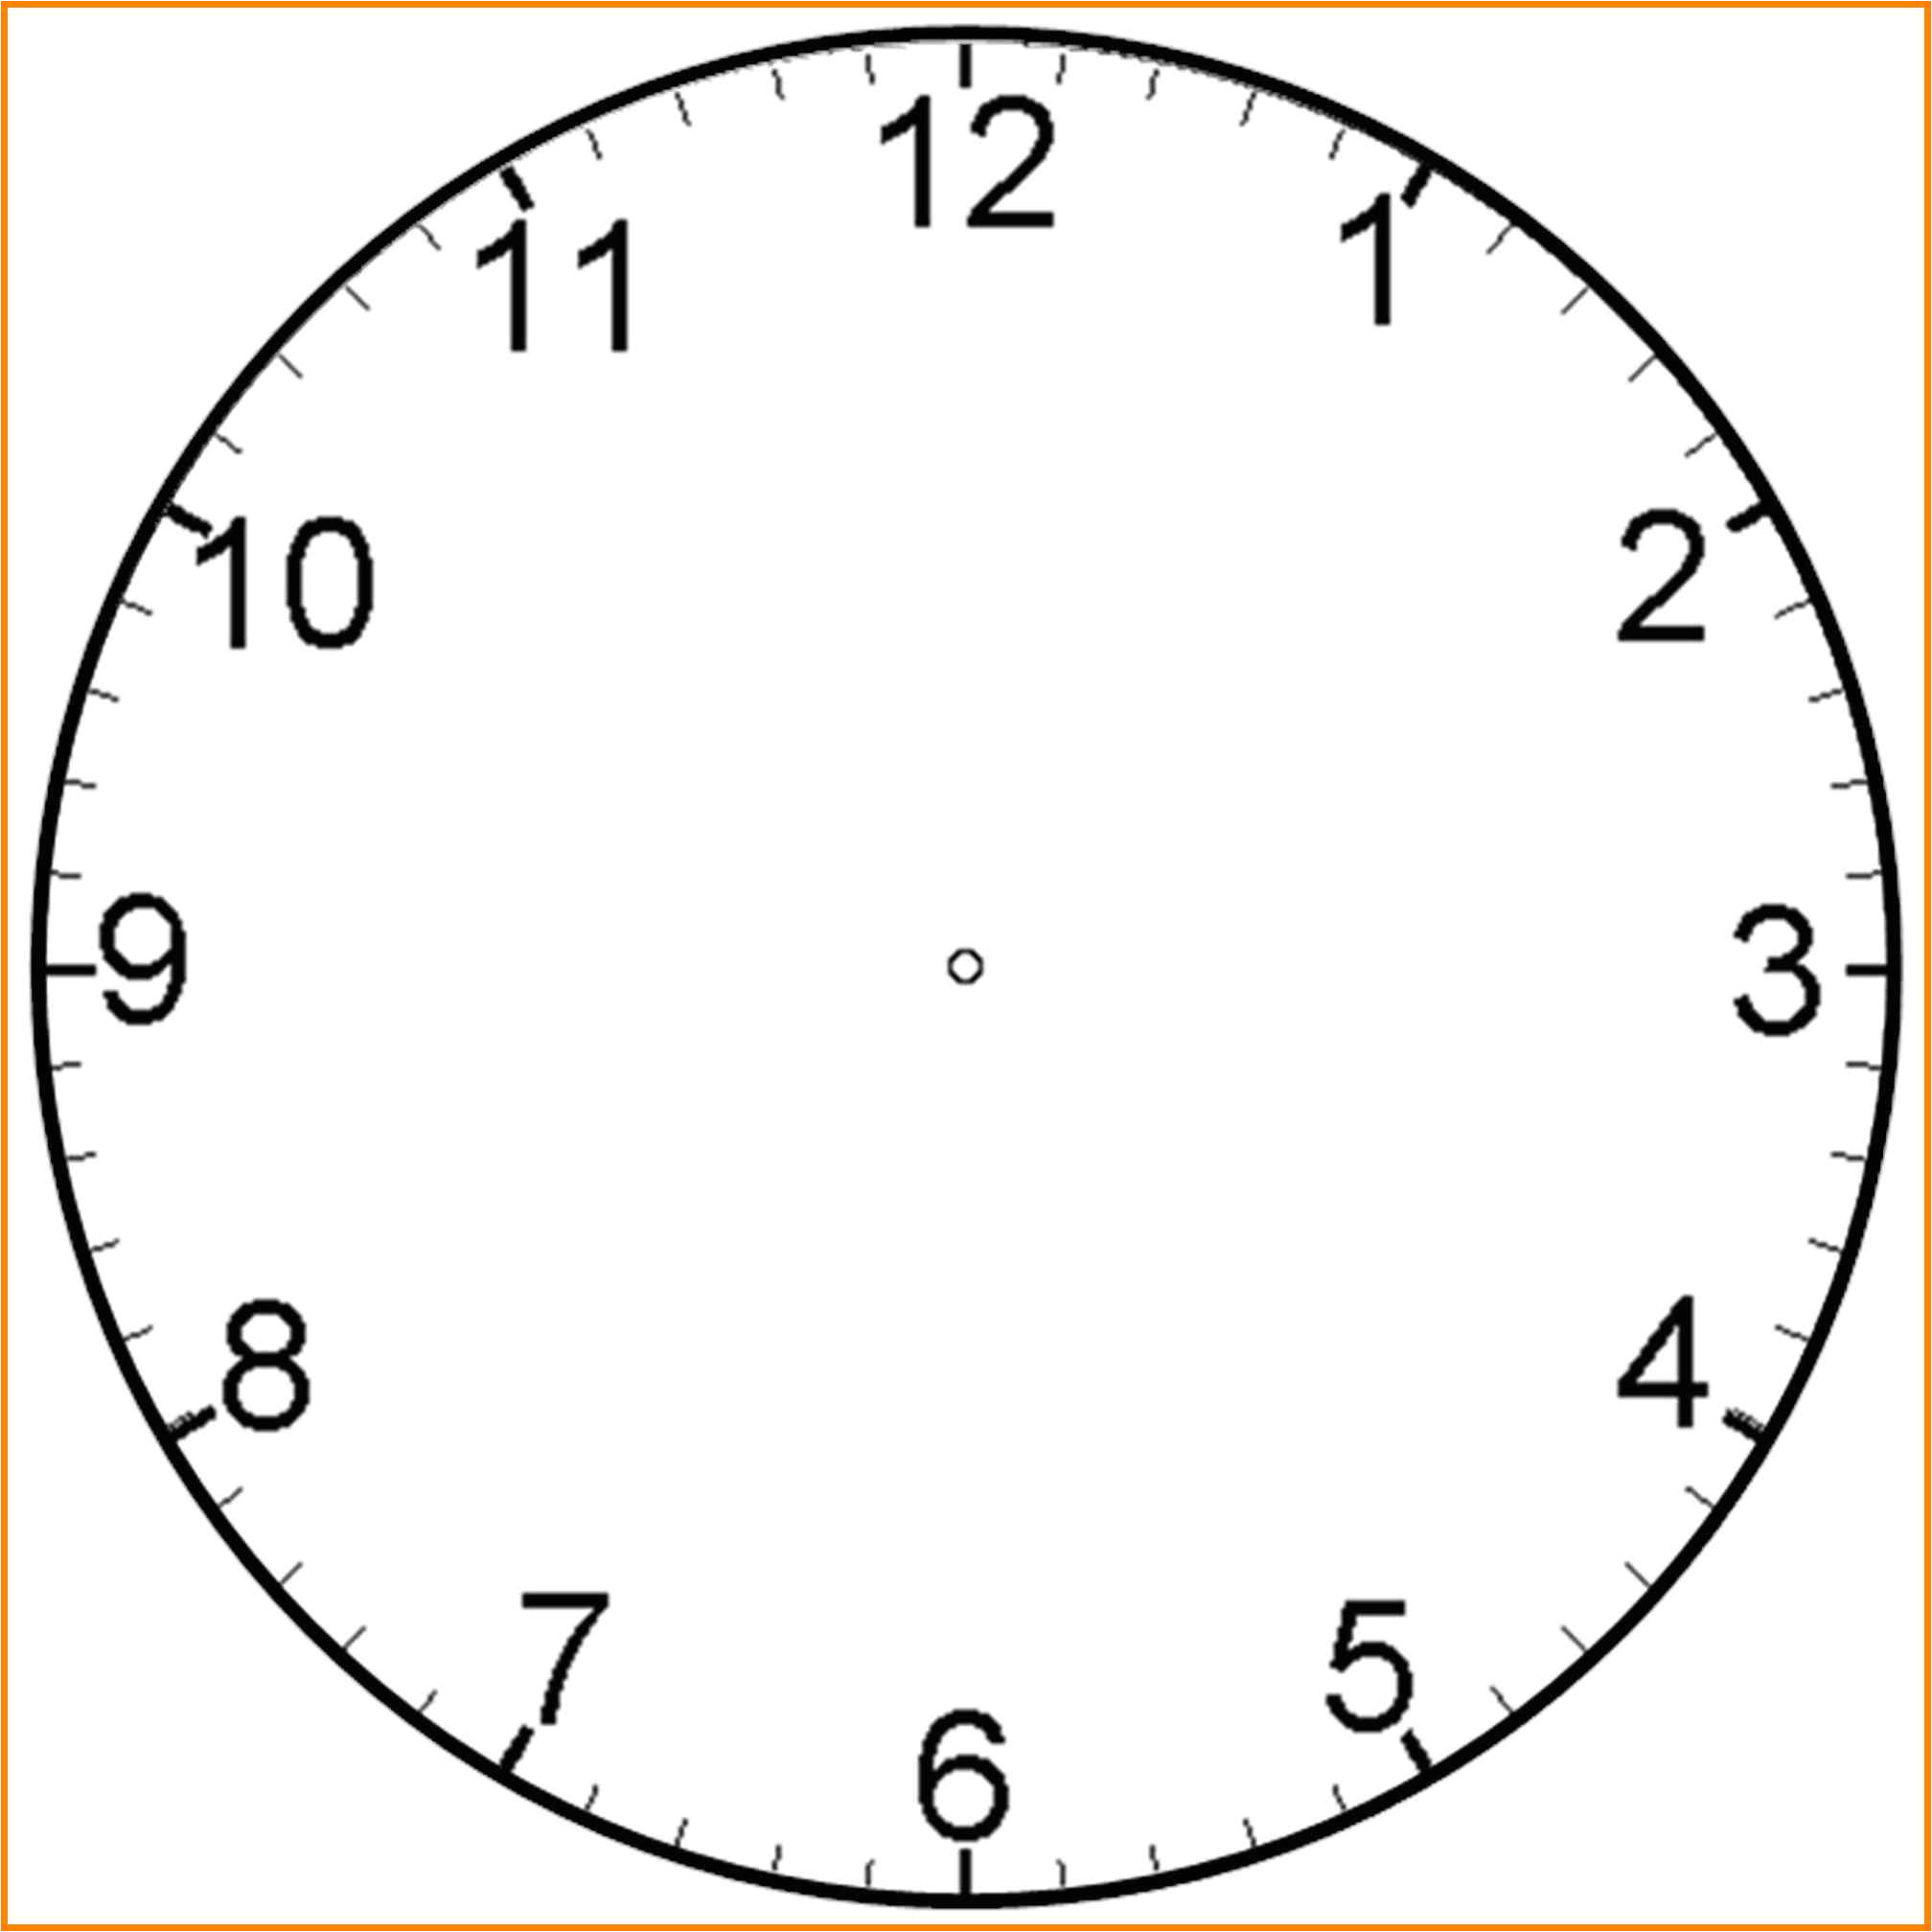 6 blank clock face